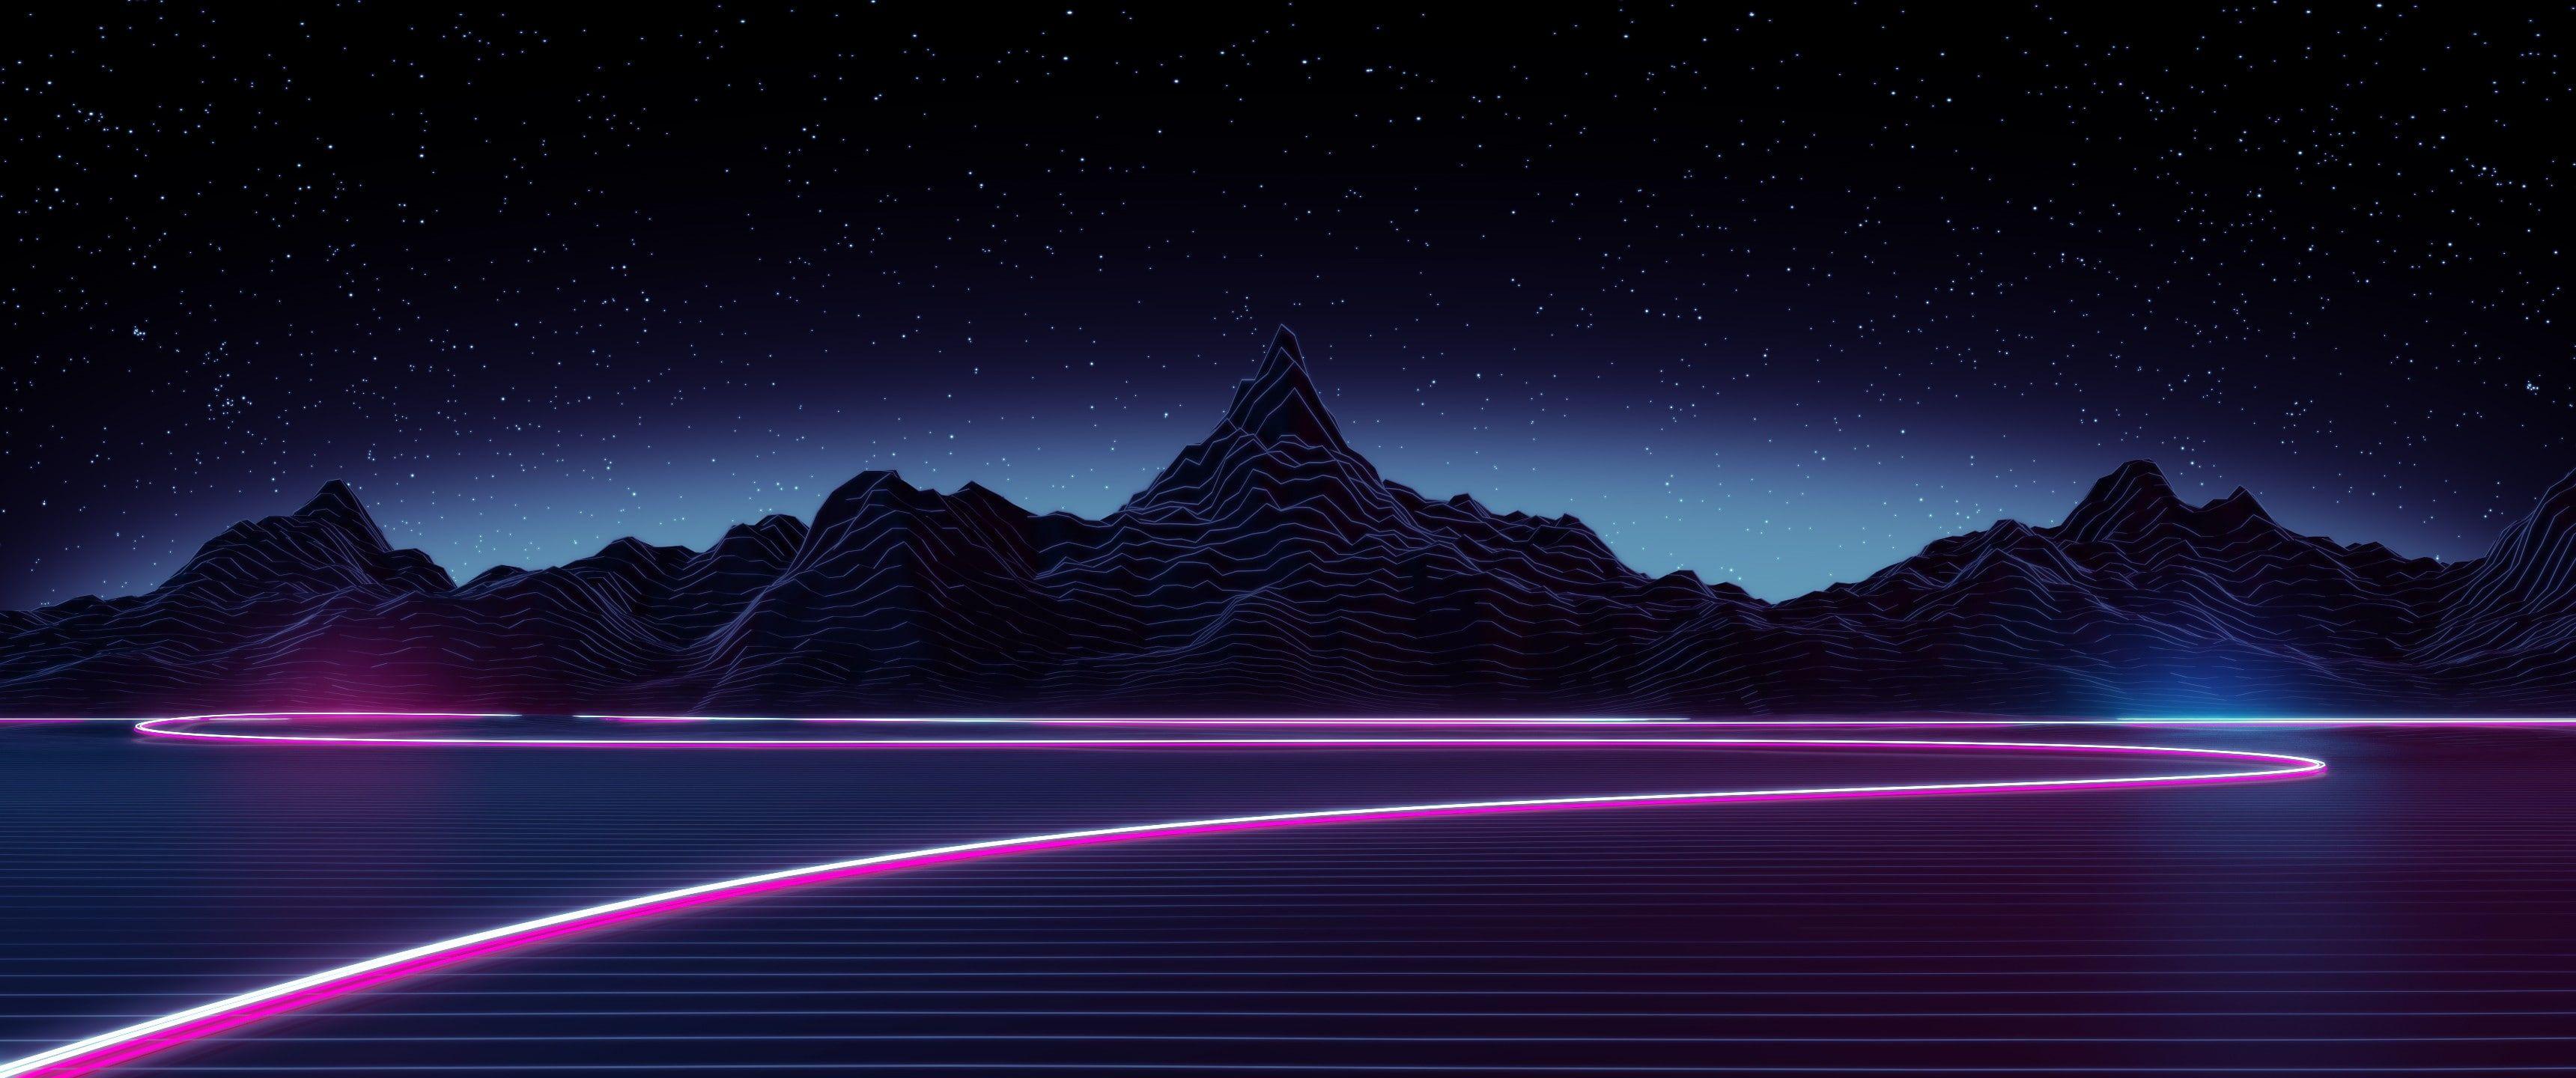 Neon Synthwave Digital Art Mountains Stars Retro Style Lake 2k Wallpaper Hdwallpaper Desktop Vaporwave Wallpaper Neon Wallpaper Aesthetic Wallpapers